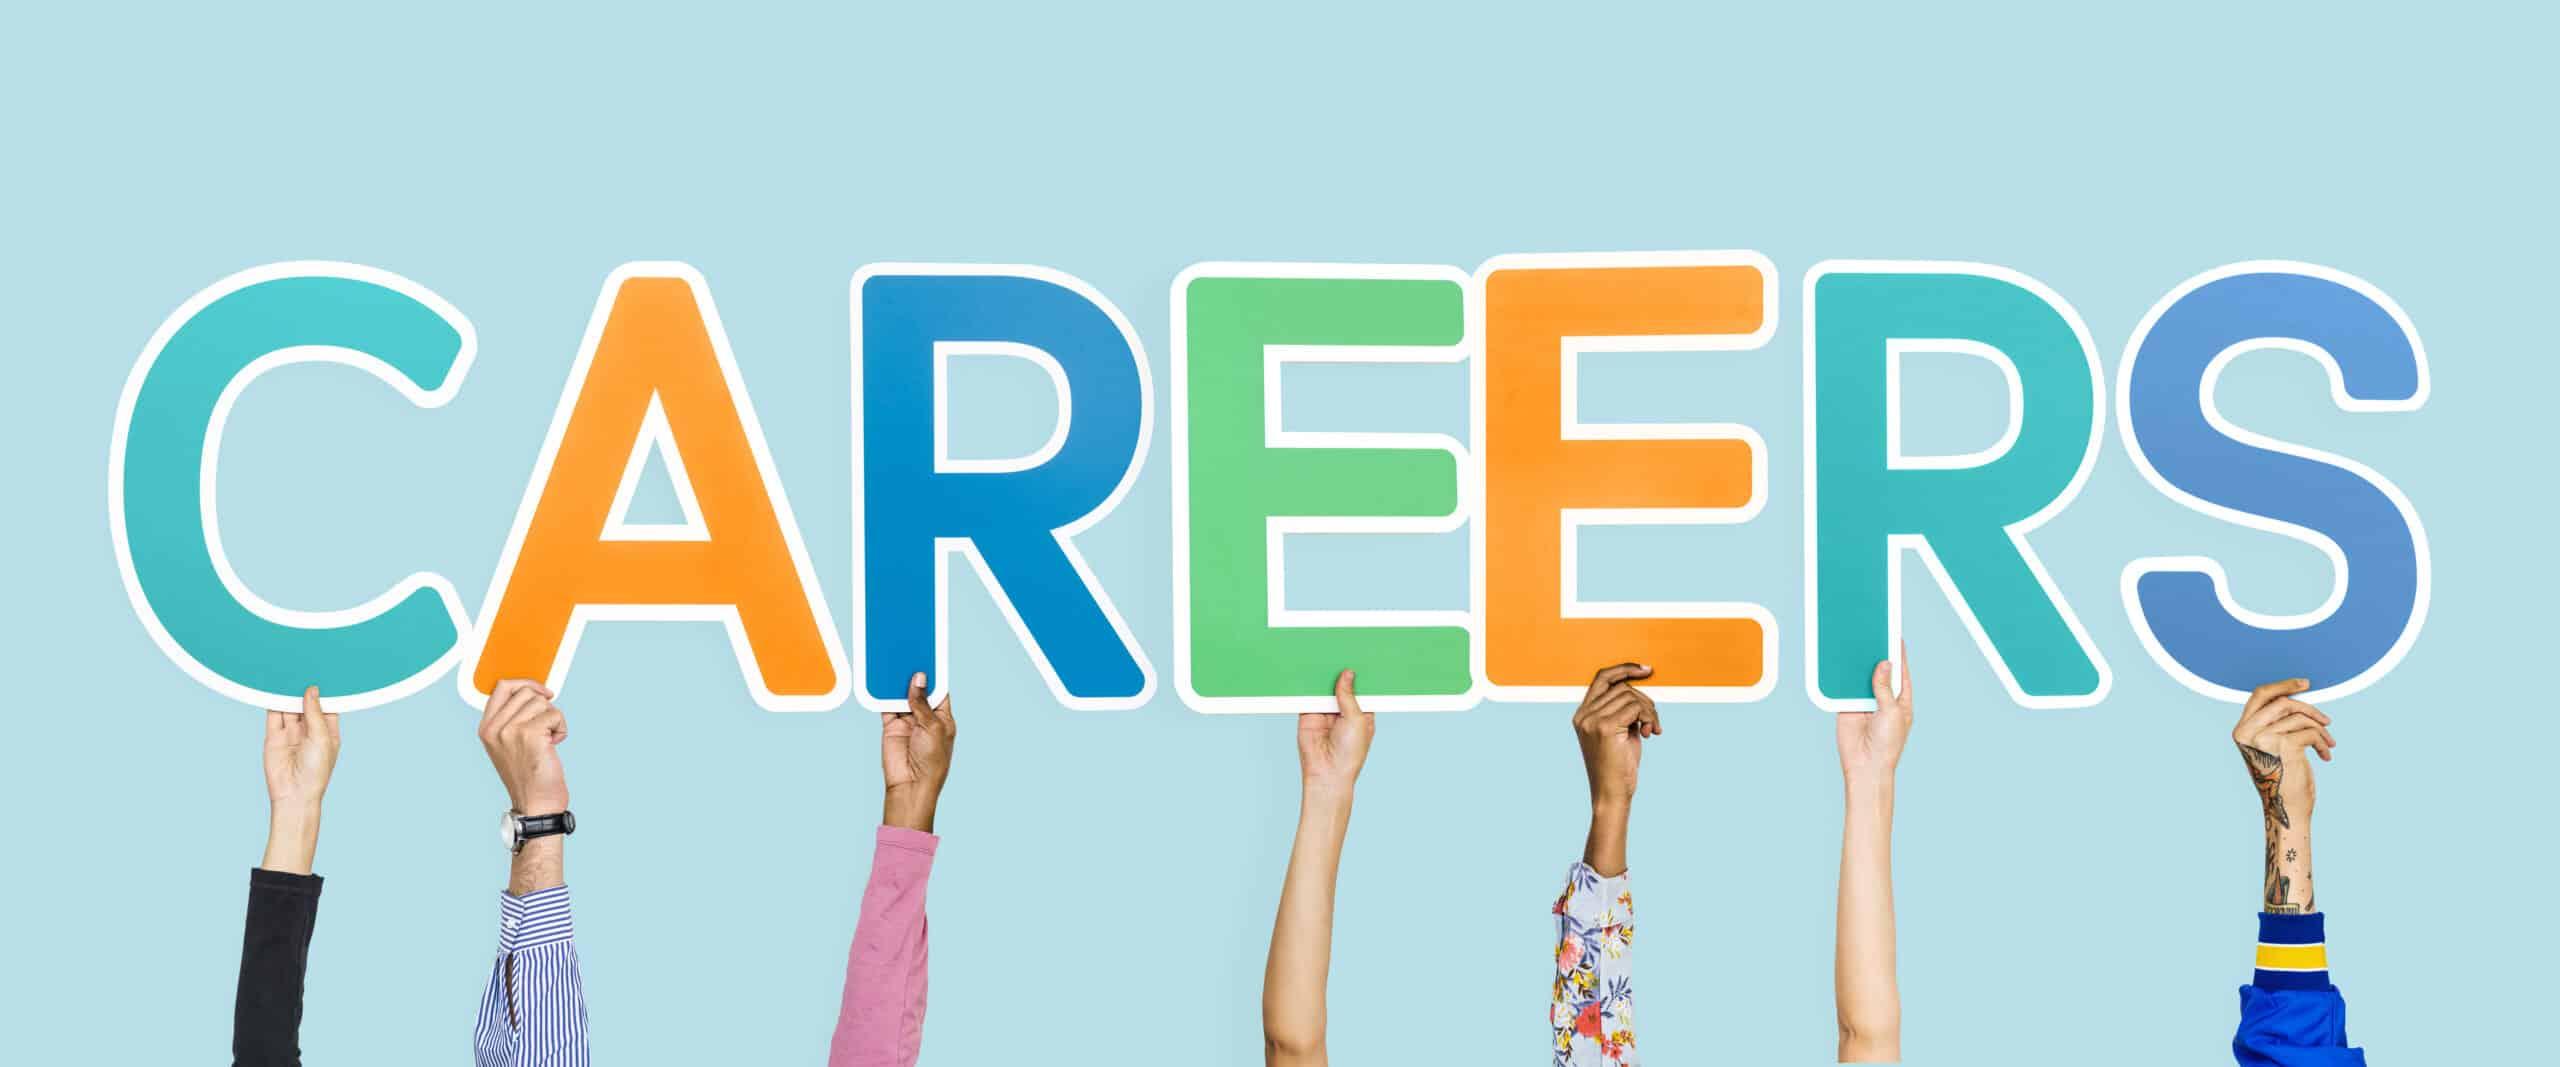 Careers in Energy Panel #2 – October 25, 2021